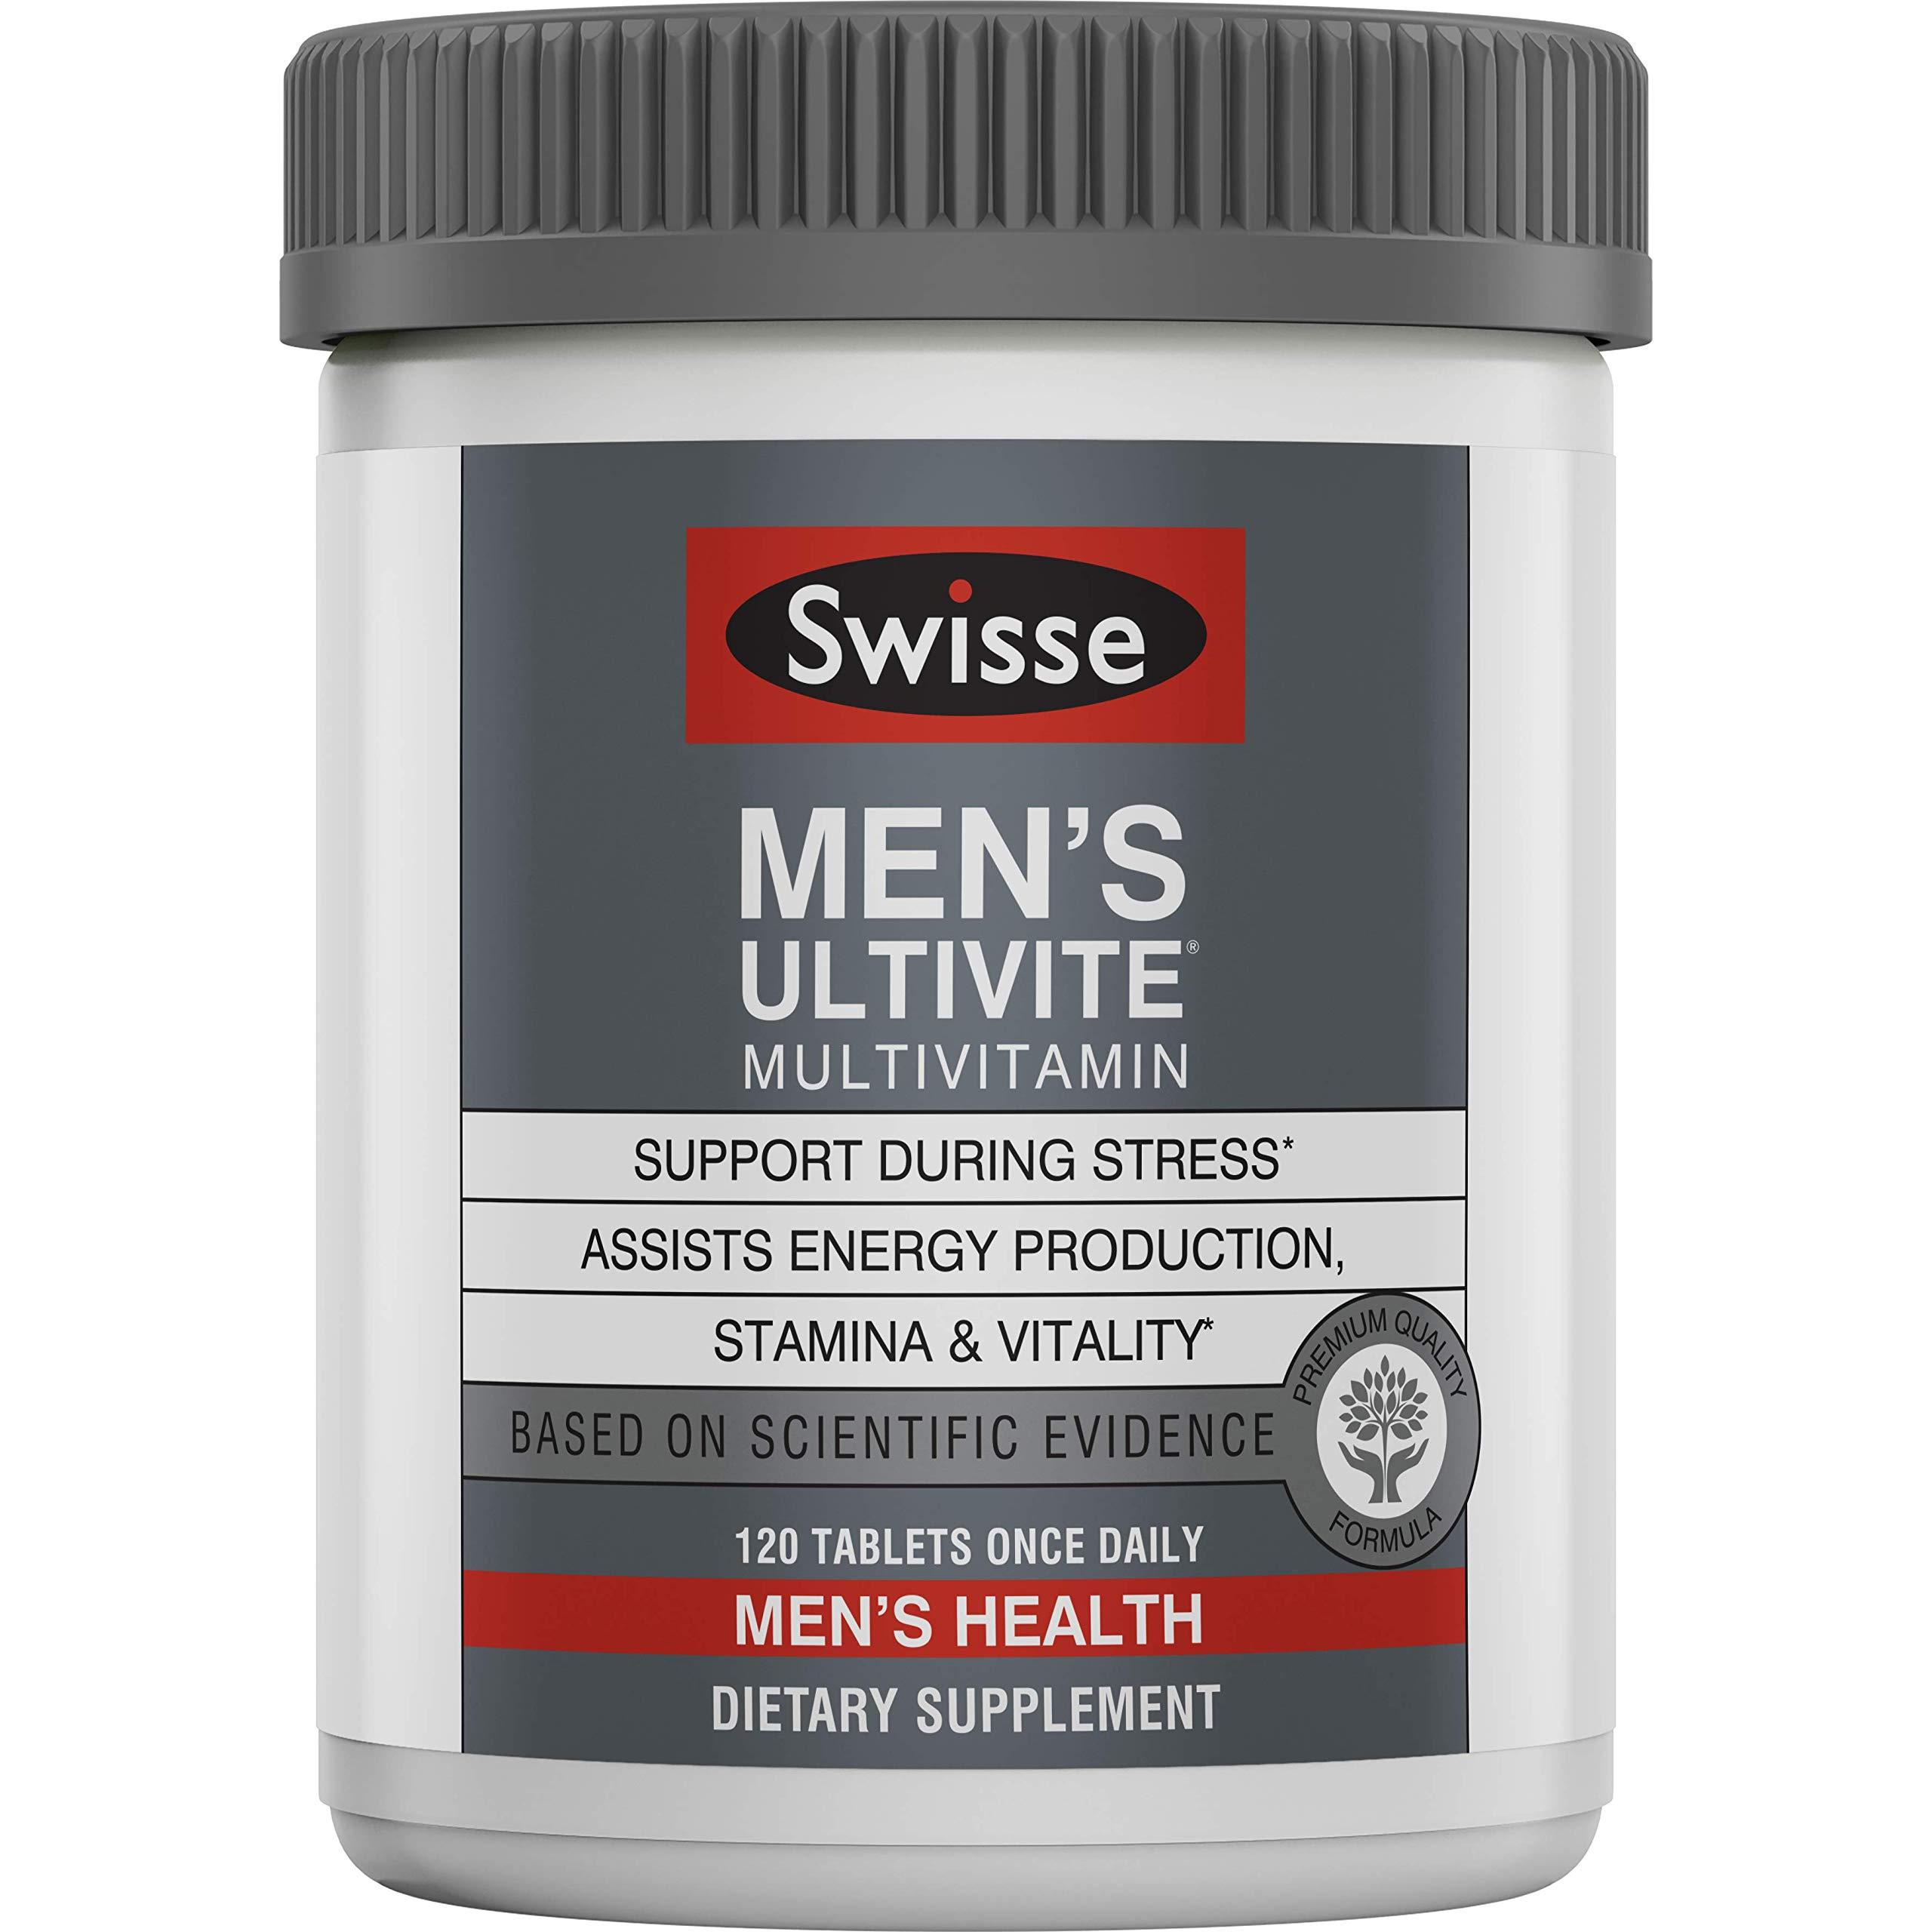 Swisse Premium Ultivite Daily Multivitamin for Men   Energy & Stress Support, Rich in Antioxidant & Minerals   Vitamin A, Vitamin C, Vitamin D, Biotin, Calcium, Zinc & More   120 Tablets